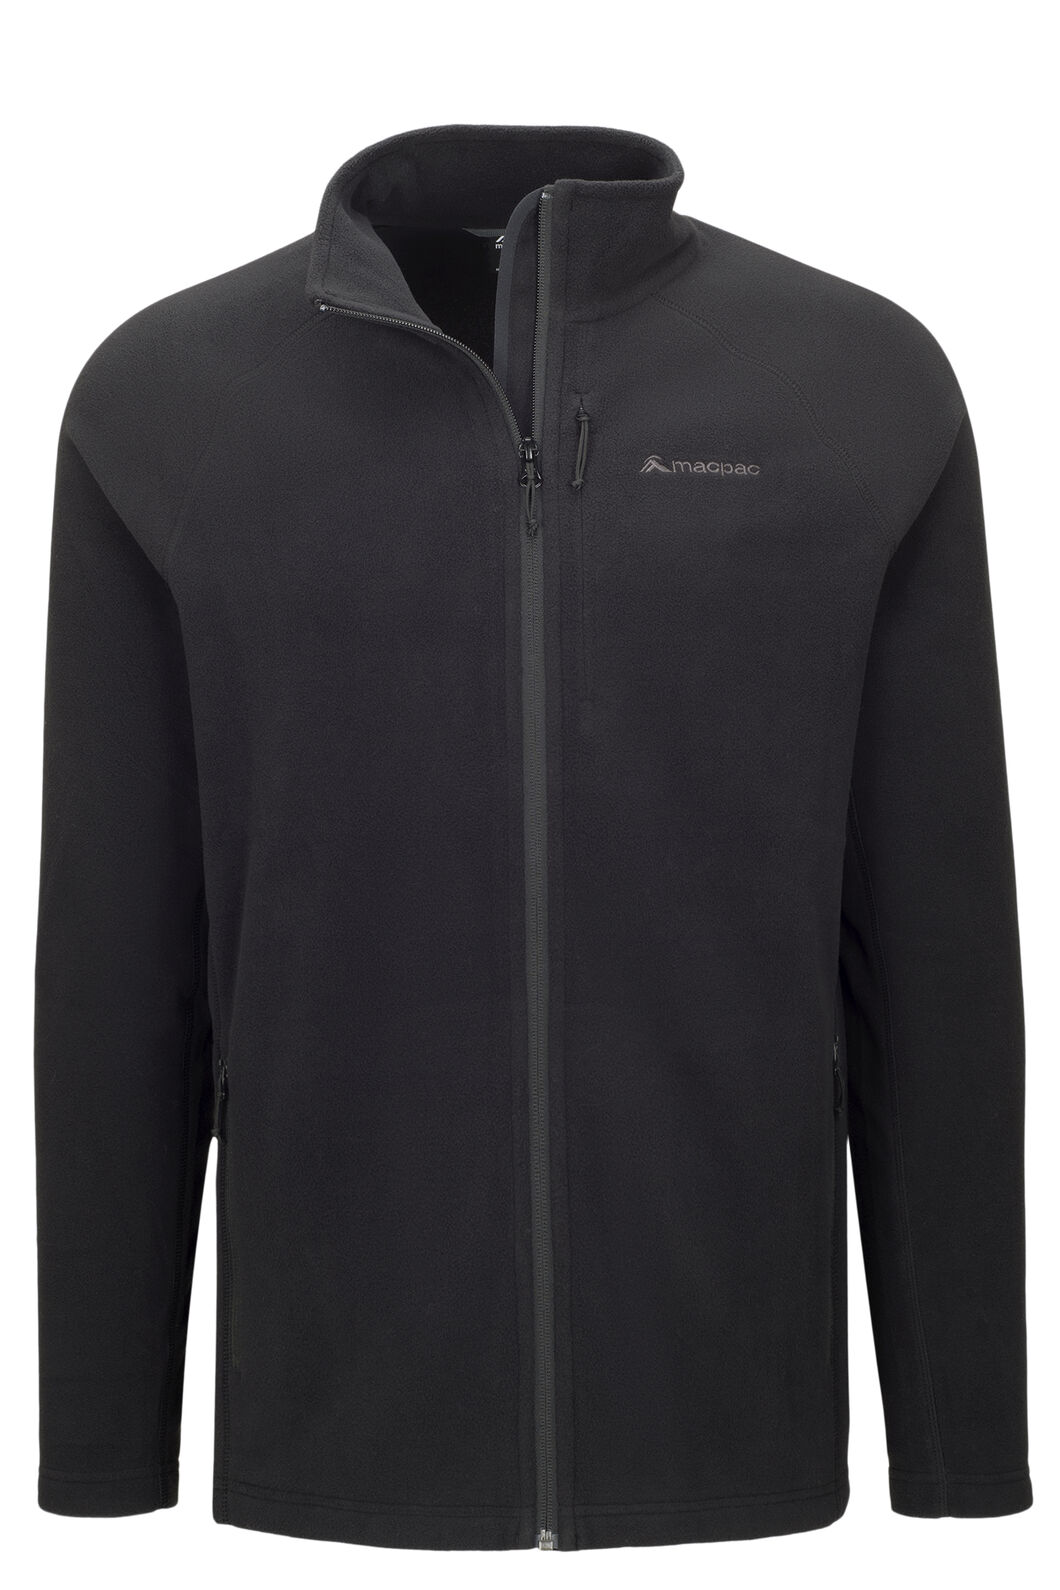 Macpac Tui Polartec® Micro Fleece® Jacket — Men's, Black, hi-res